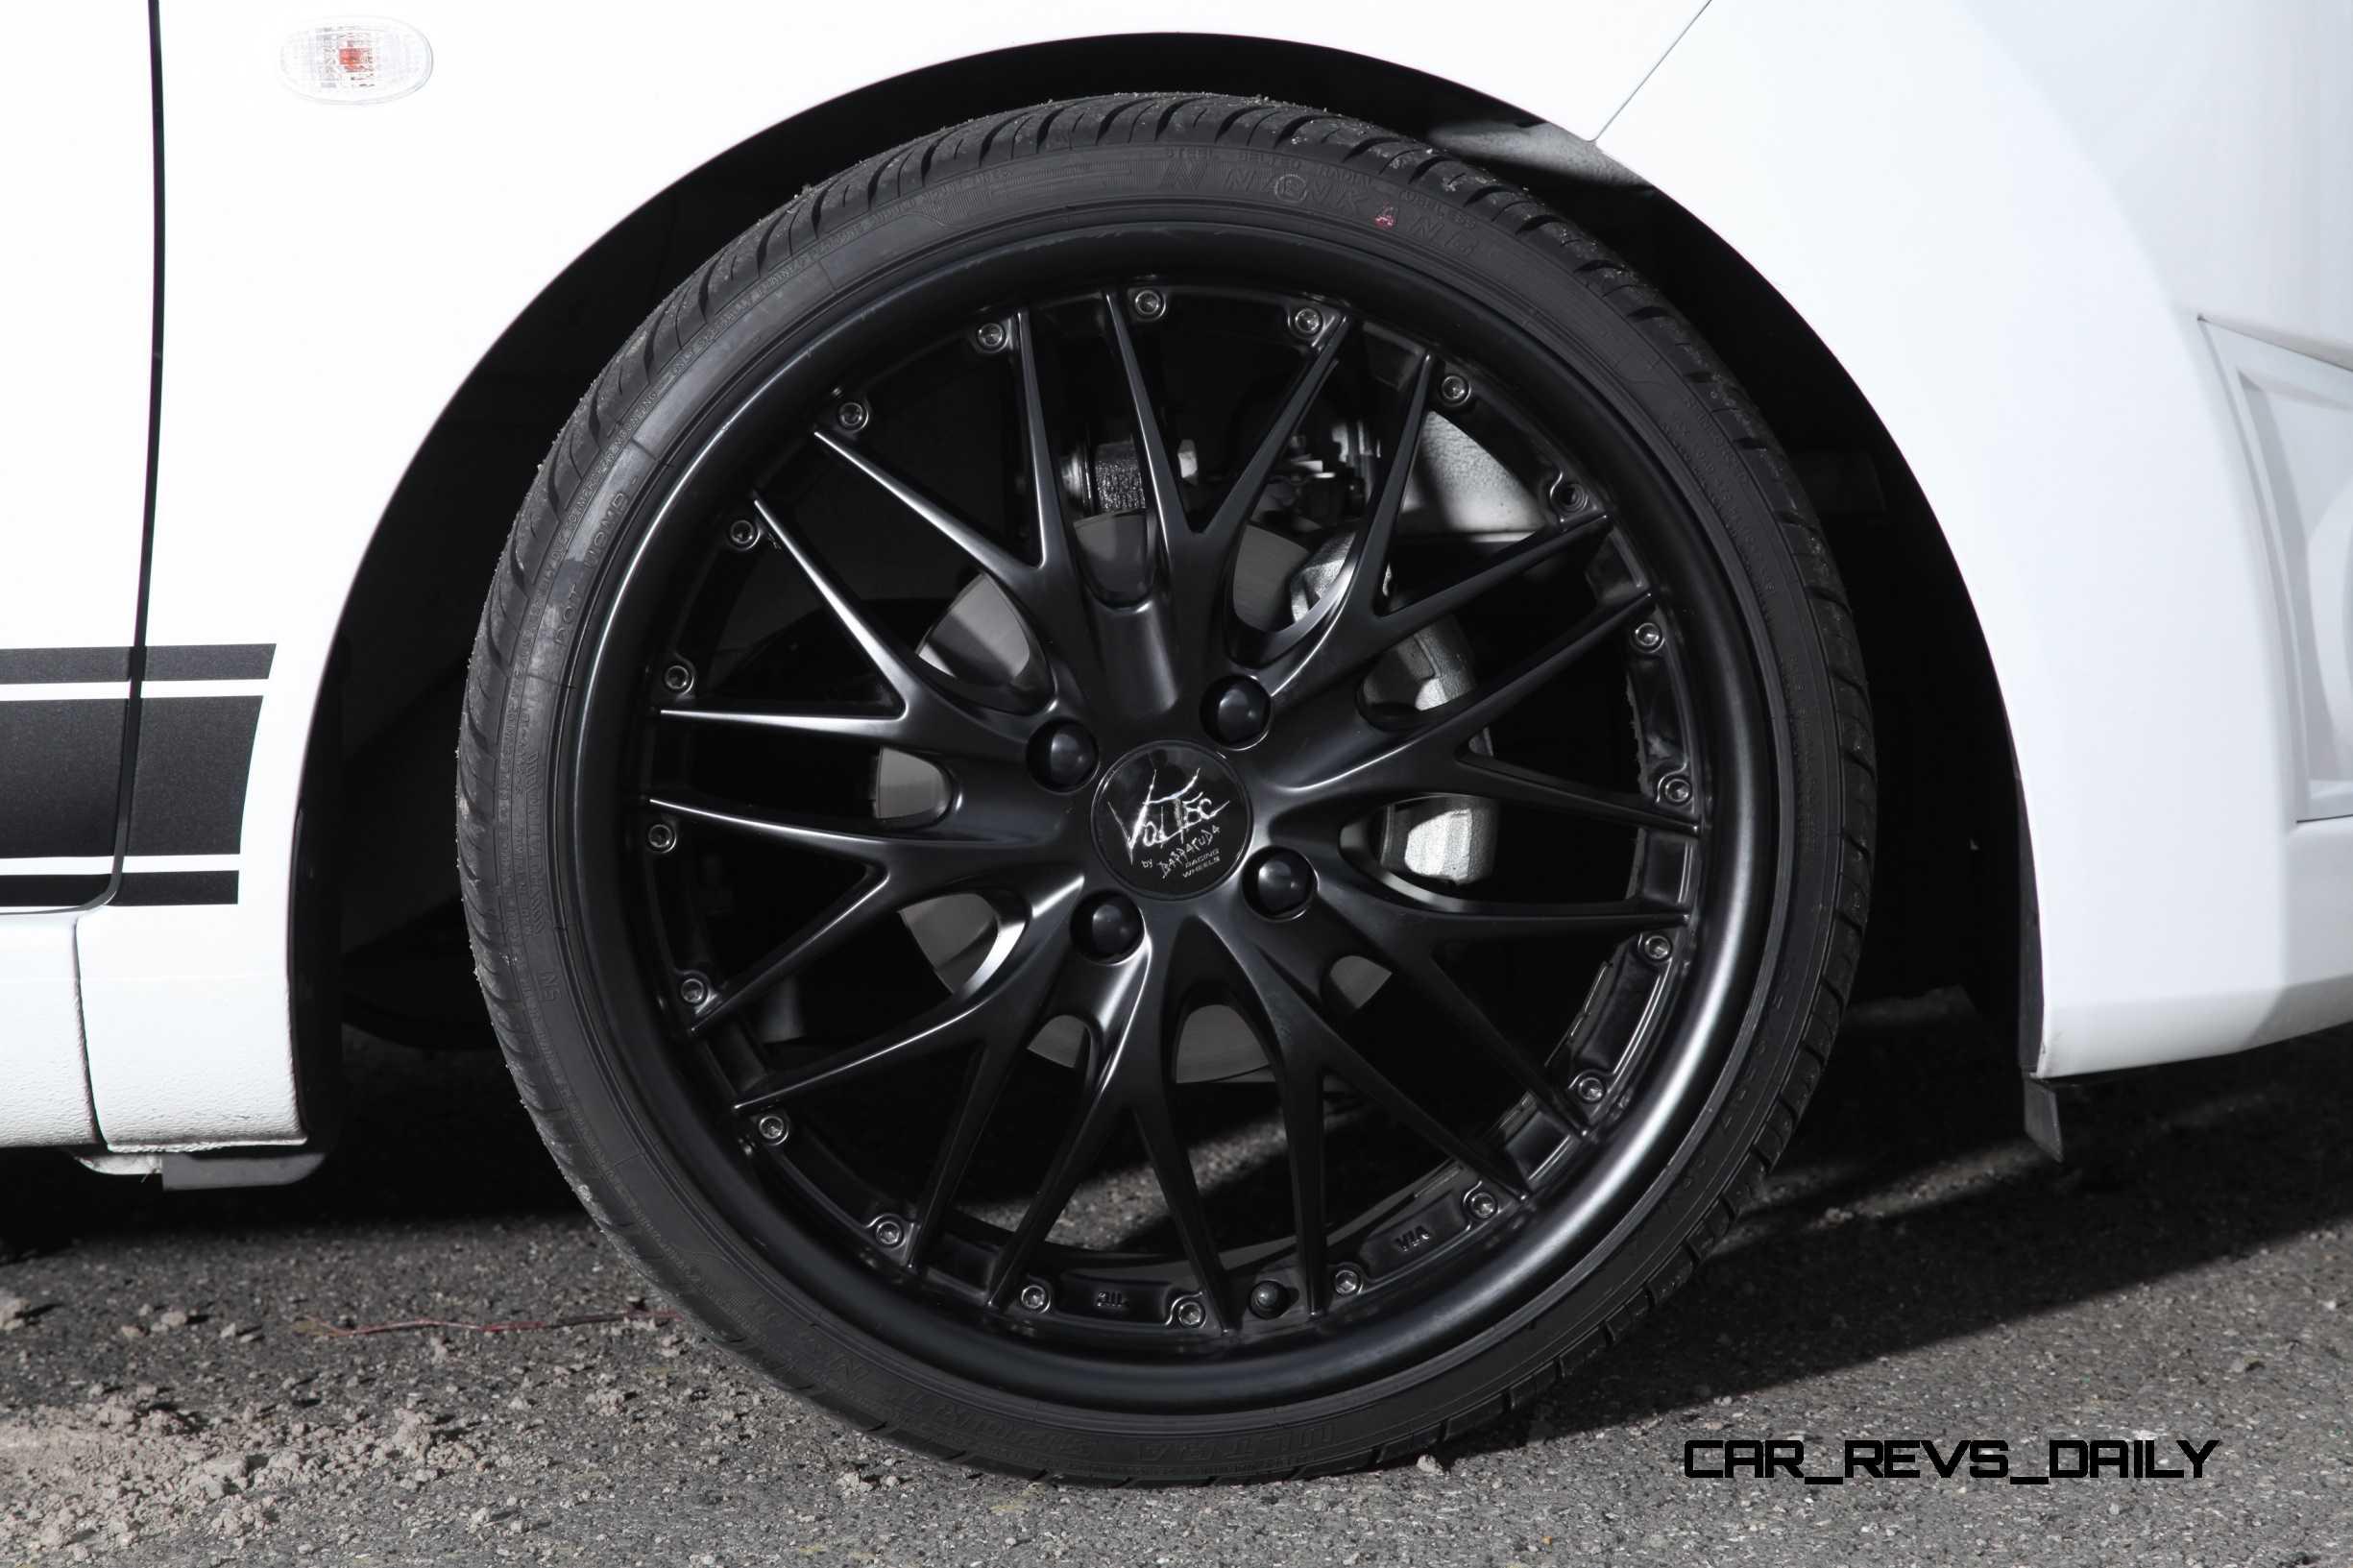 Tuner Showcase Chevrolet Spark By KBR Motorsport